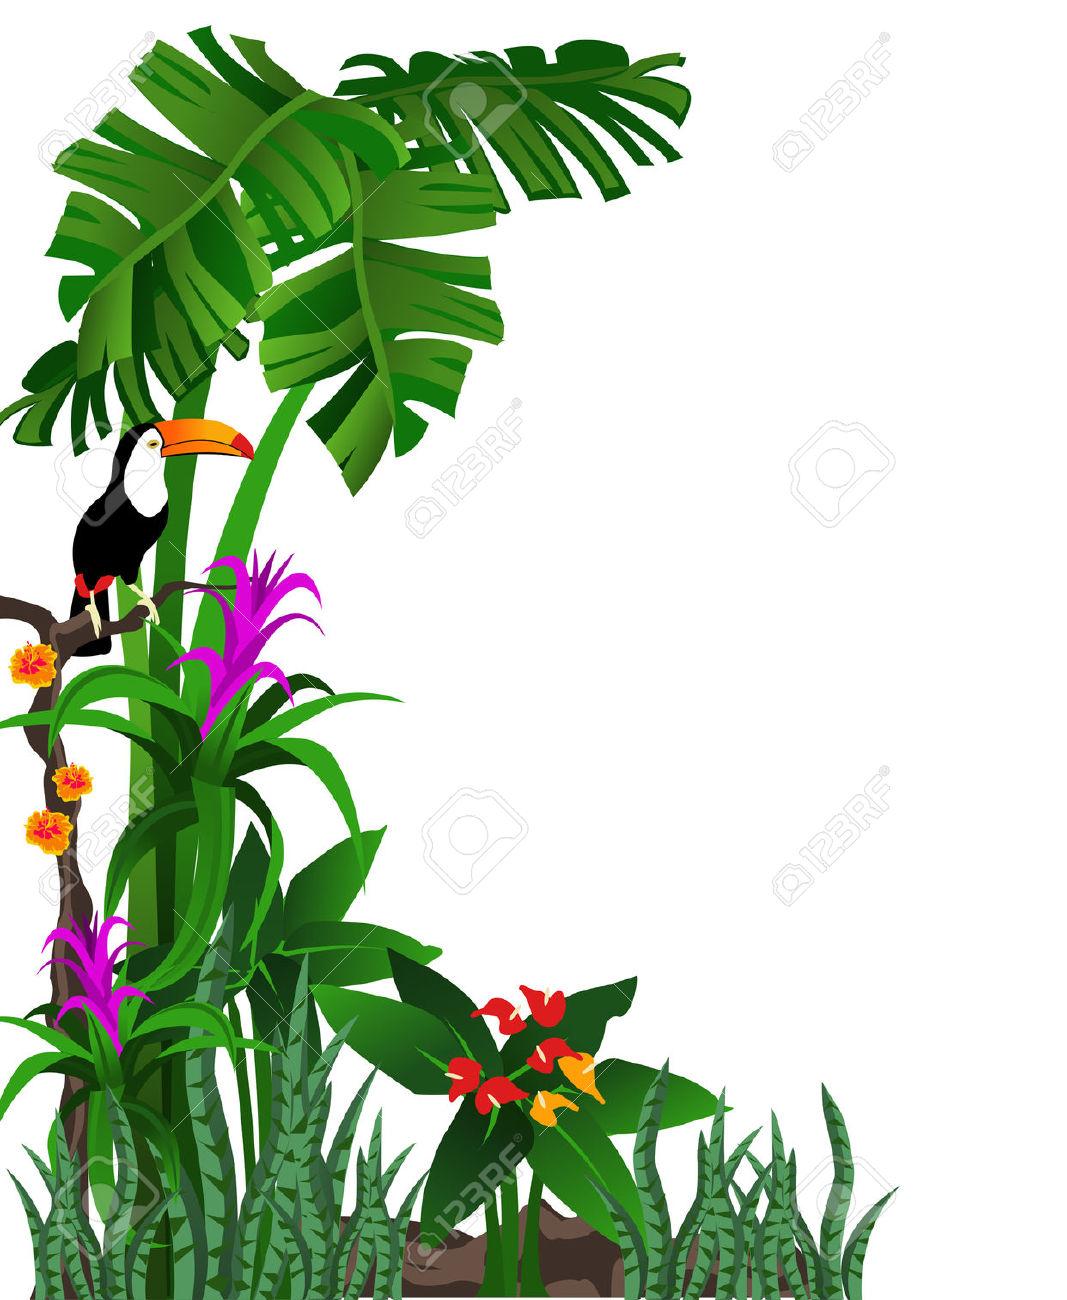 Tropical rainforest clipart jpg library stock 86+ Tropical Rainforest Clipart   ClipartLook jpg library stock